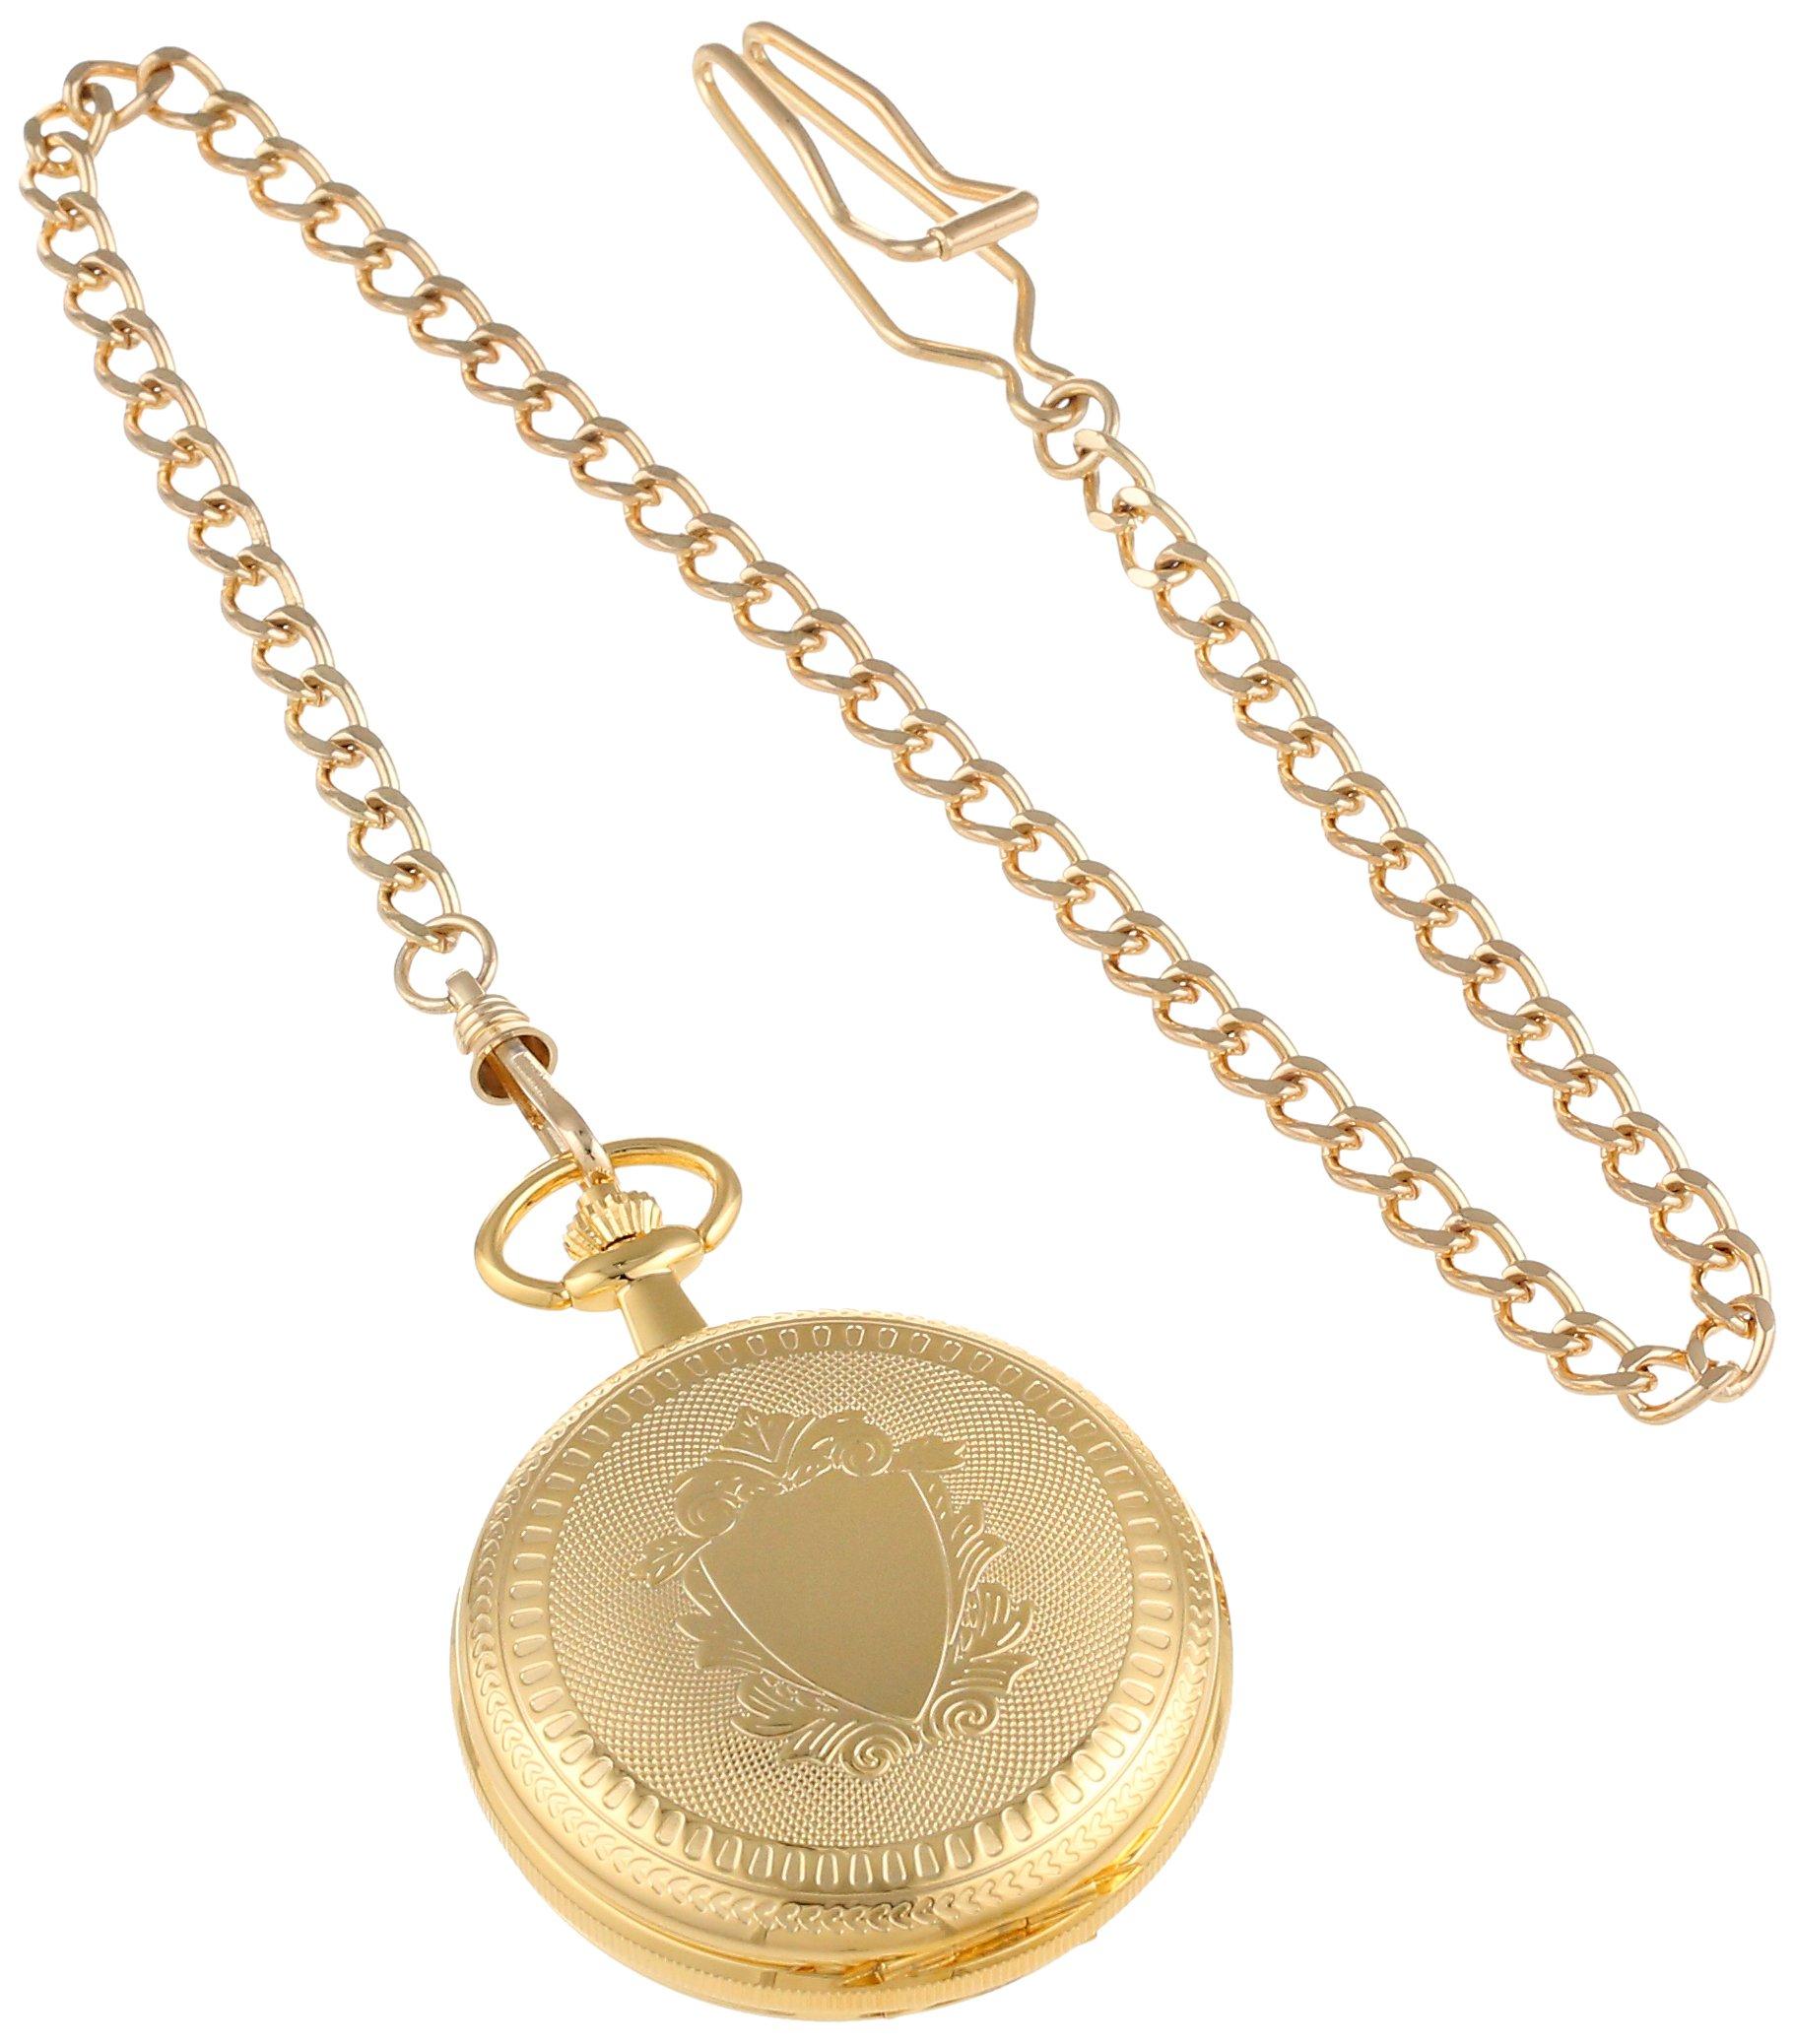 Charles-Hubert, Paris 3556 Gold-Plated Mechanical Pocket Watch by CHARLES-HUBERT PARIS (Image #2)